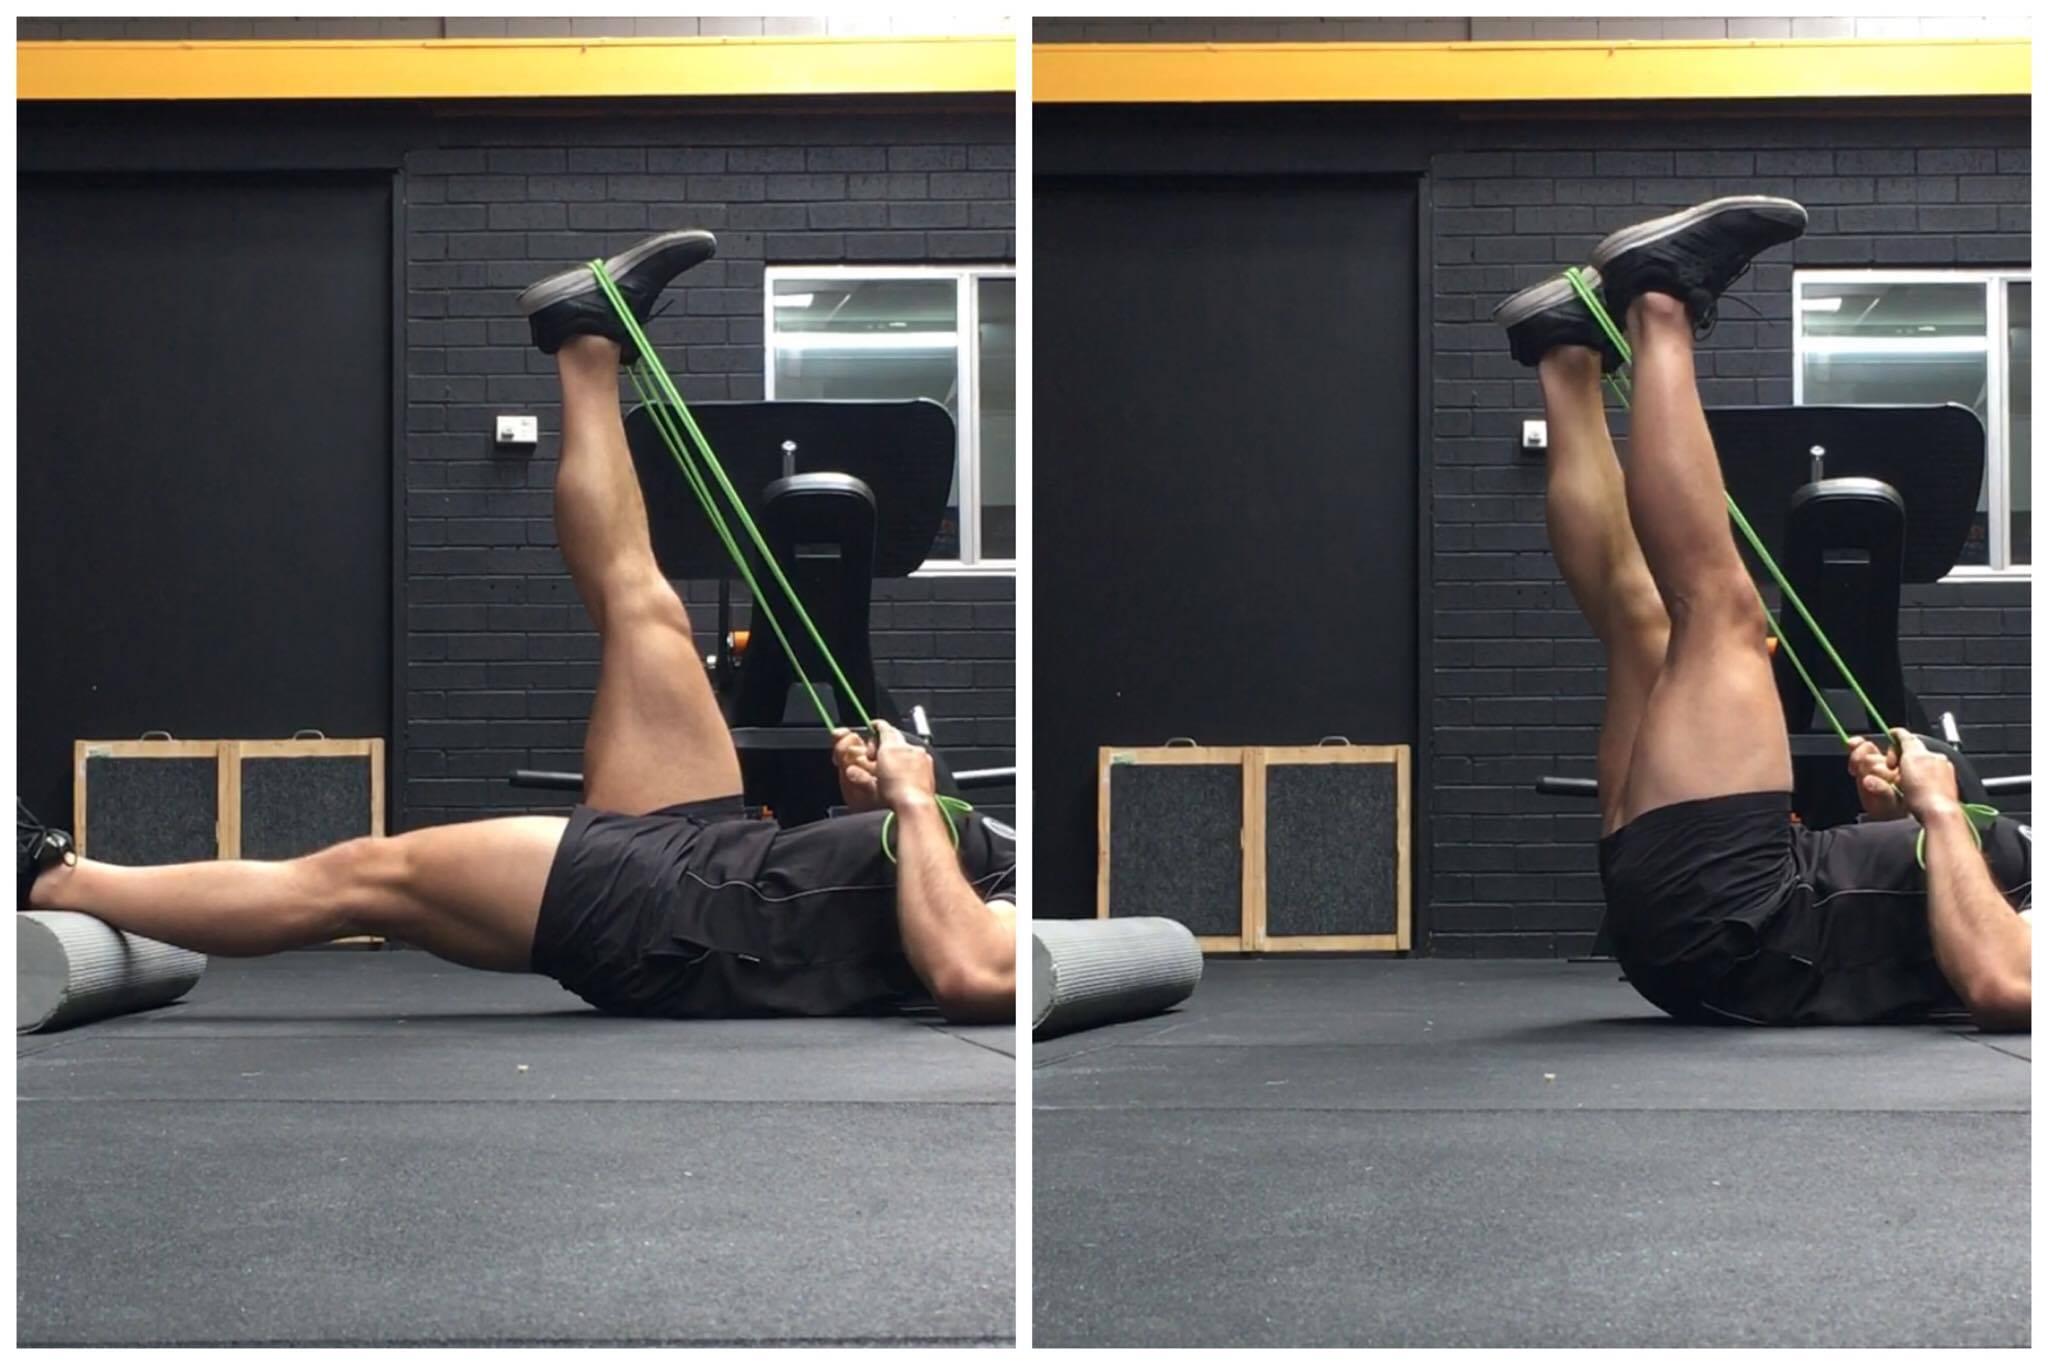 The 'Active Leg Raise' can help unlock some hidden hamstring mobility